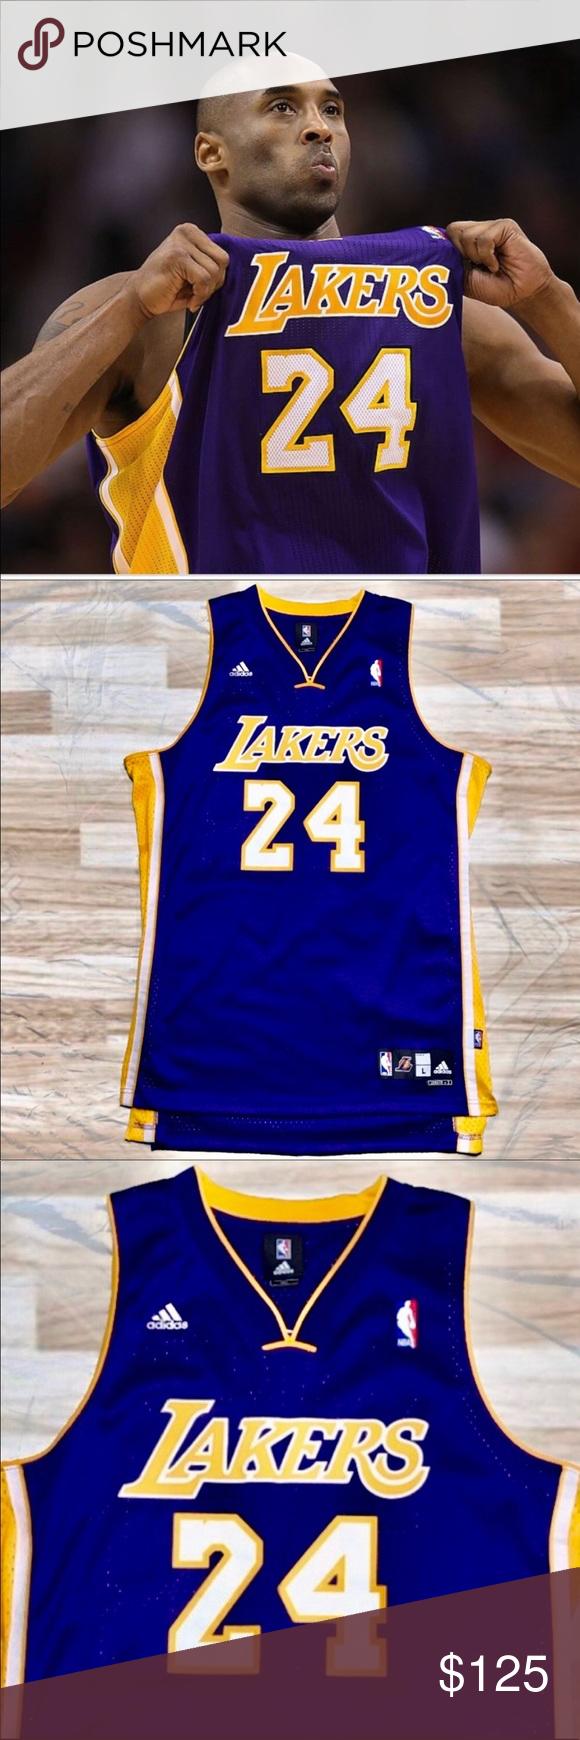 Adidas Los Angeles Lakers #24 Kobe Bryant Jersey   Adidas los ...